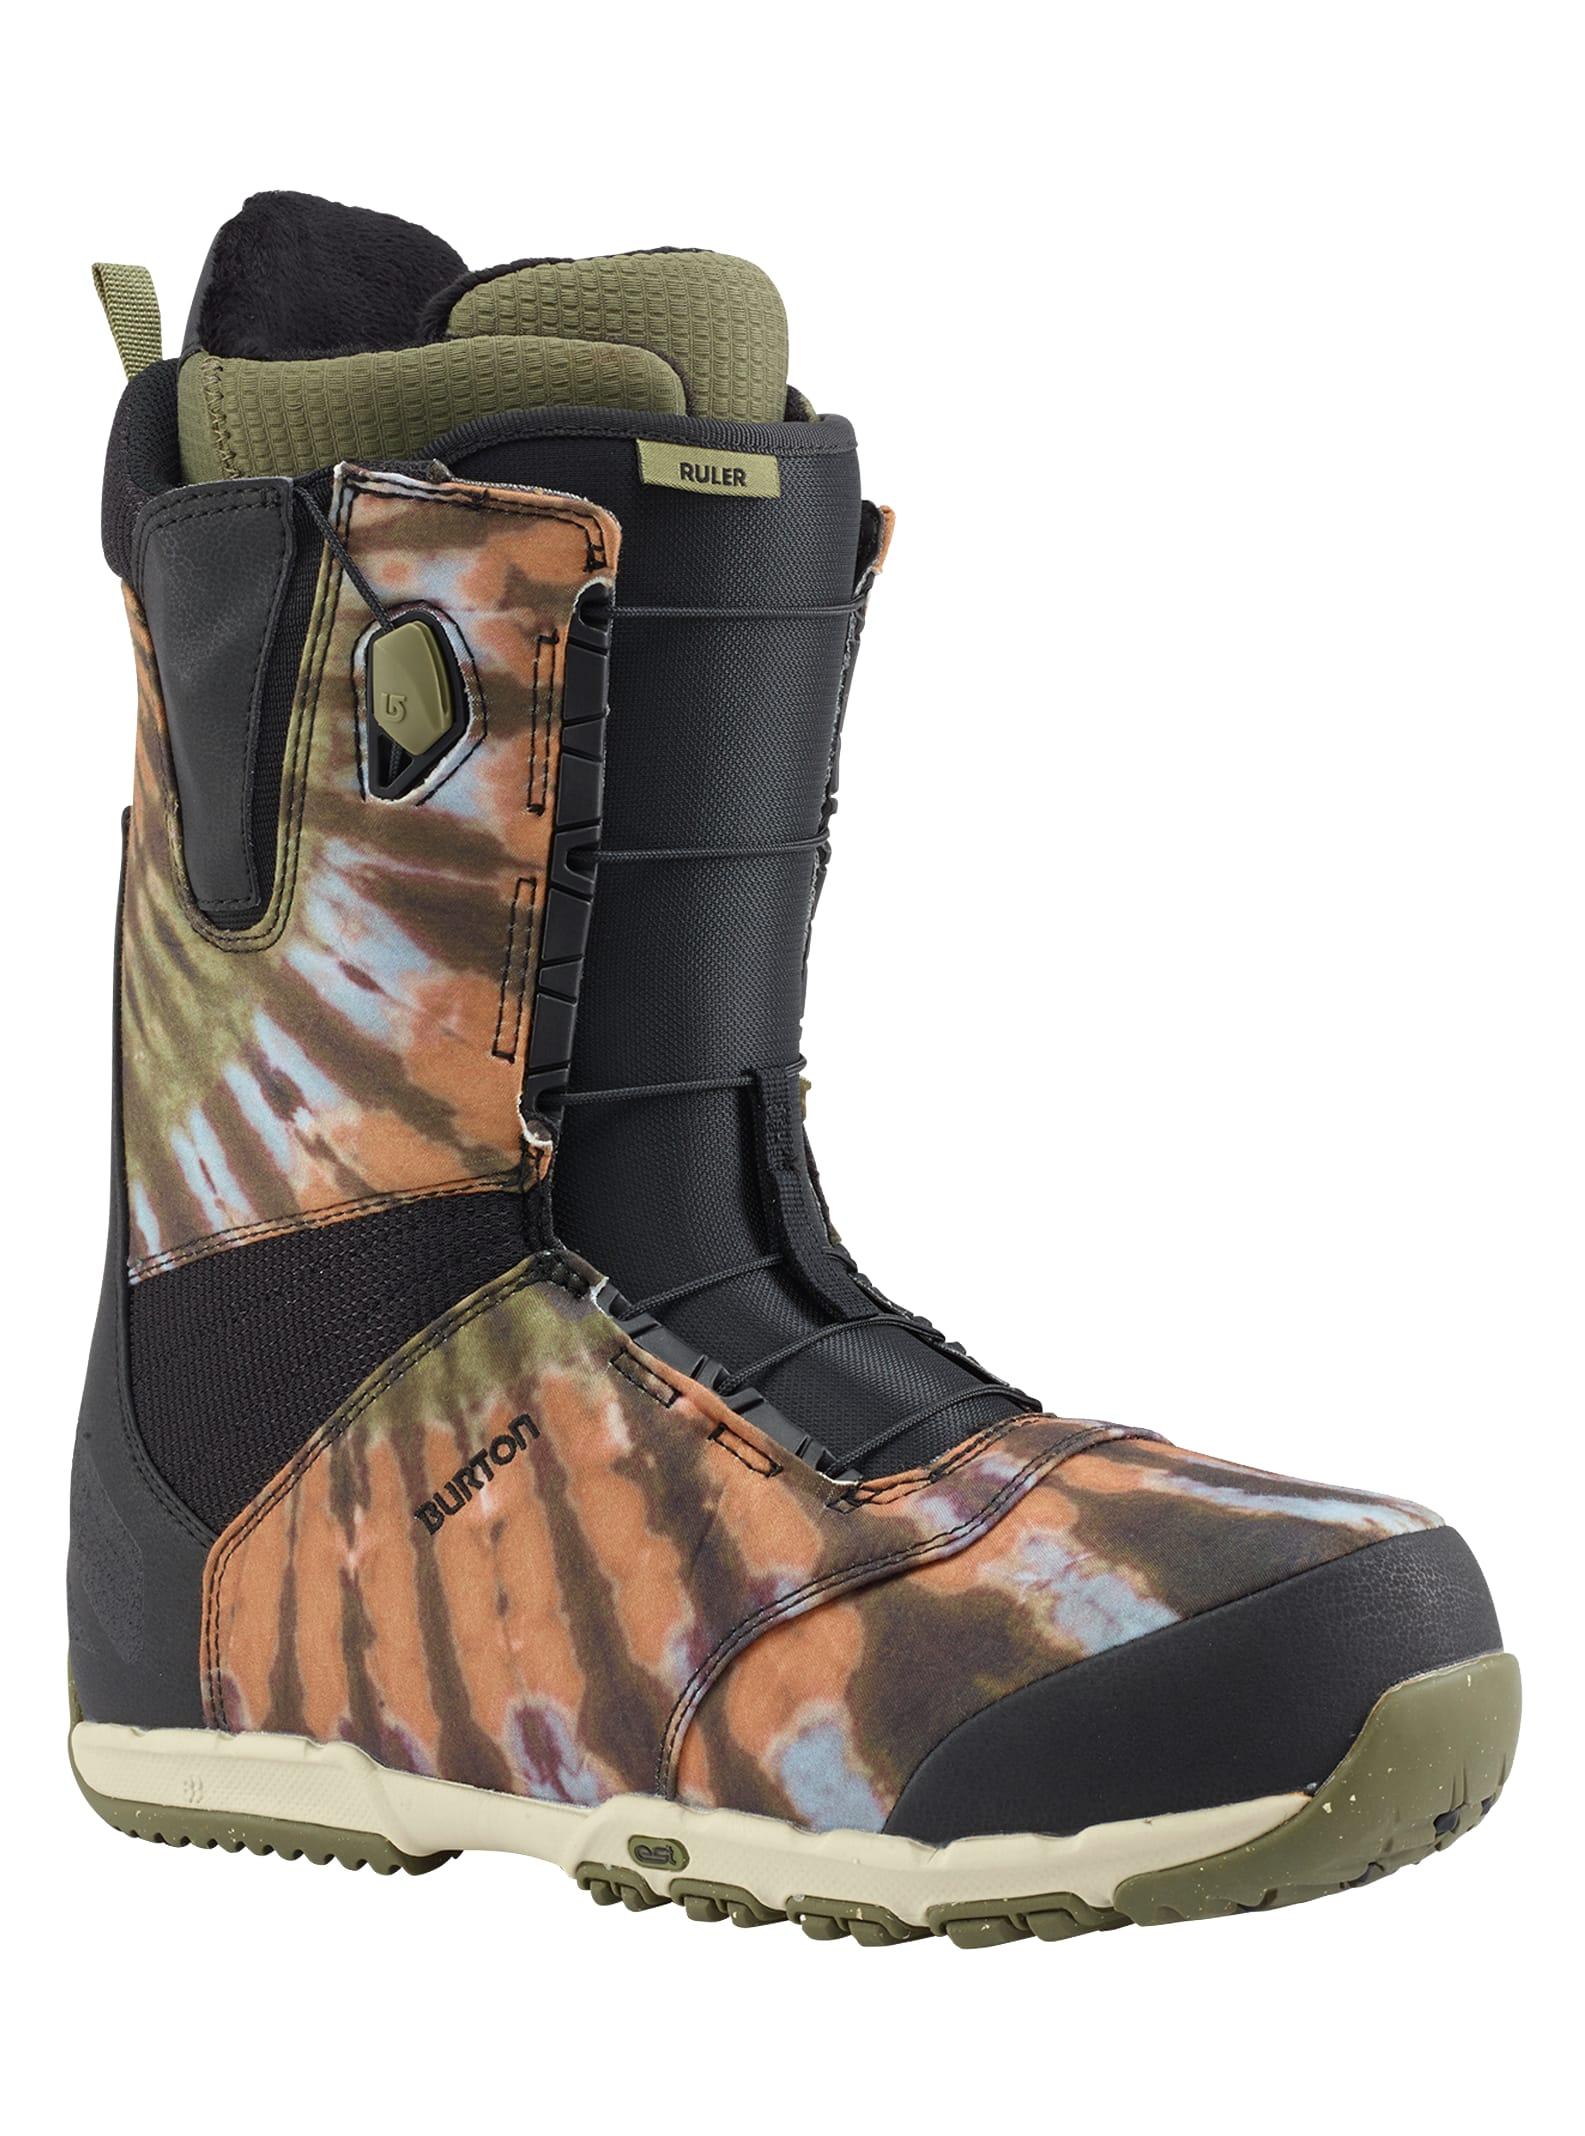 Men s Burton Ruler Snowboard Boot  328dc504a26